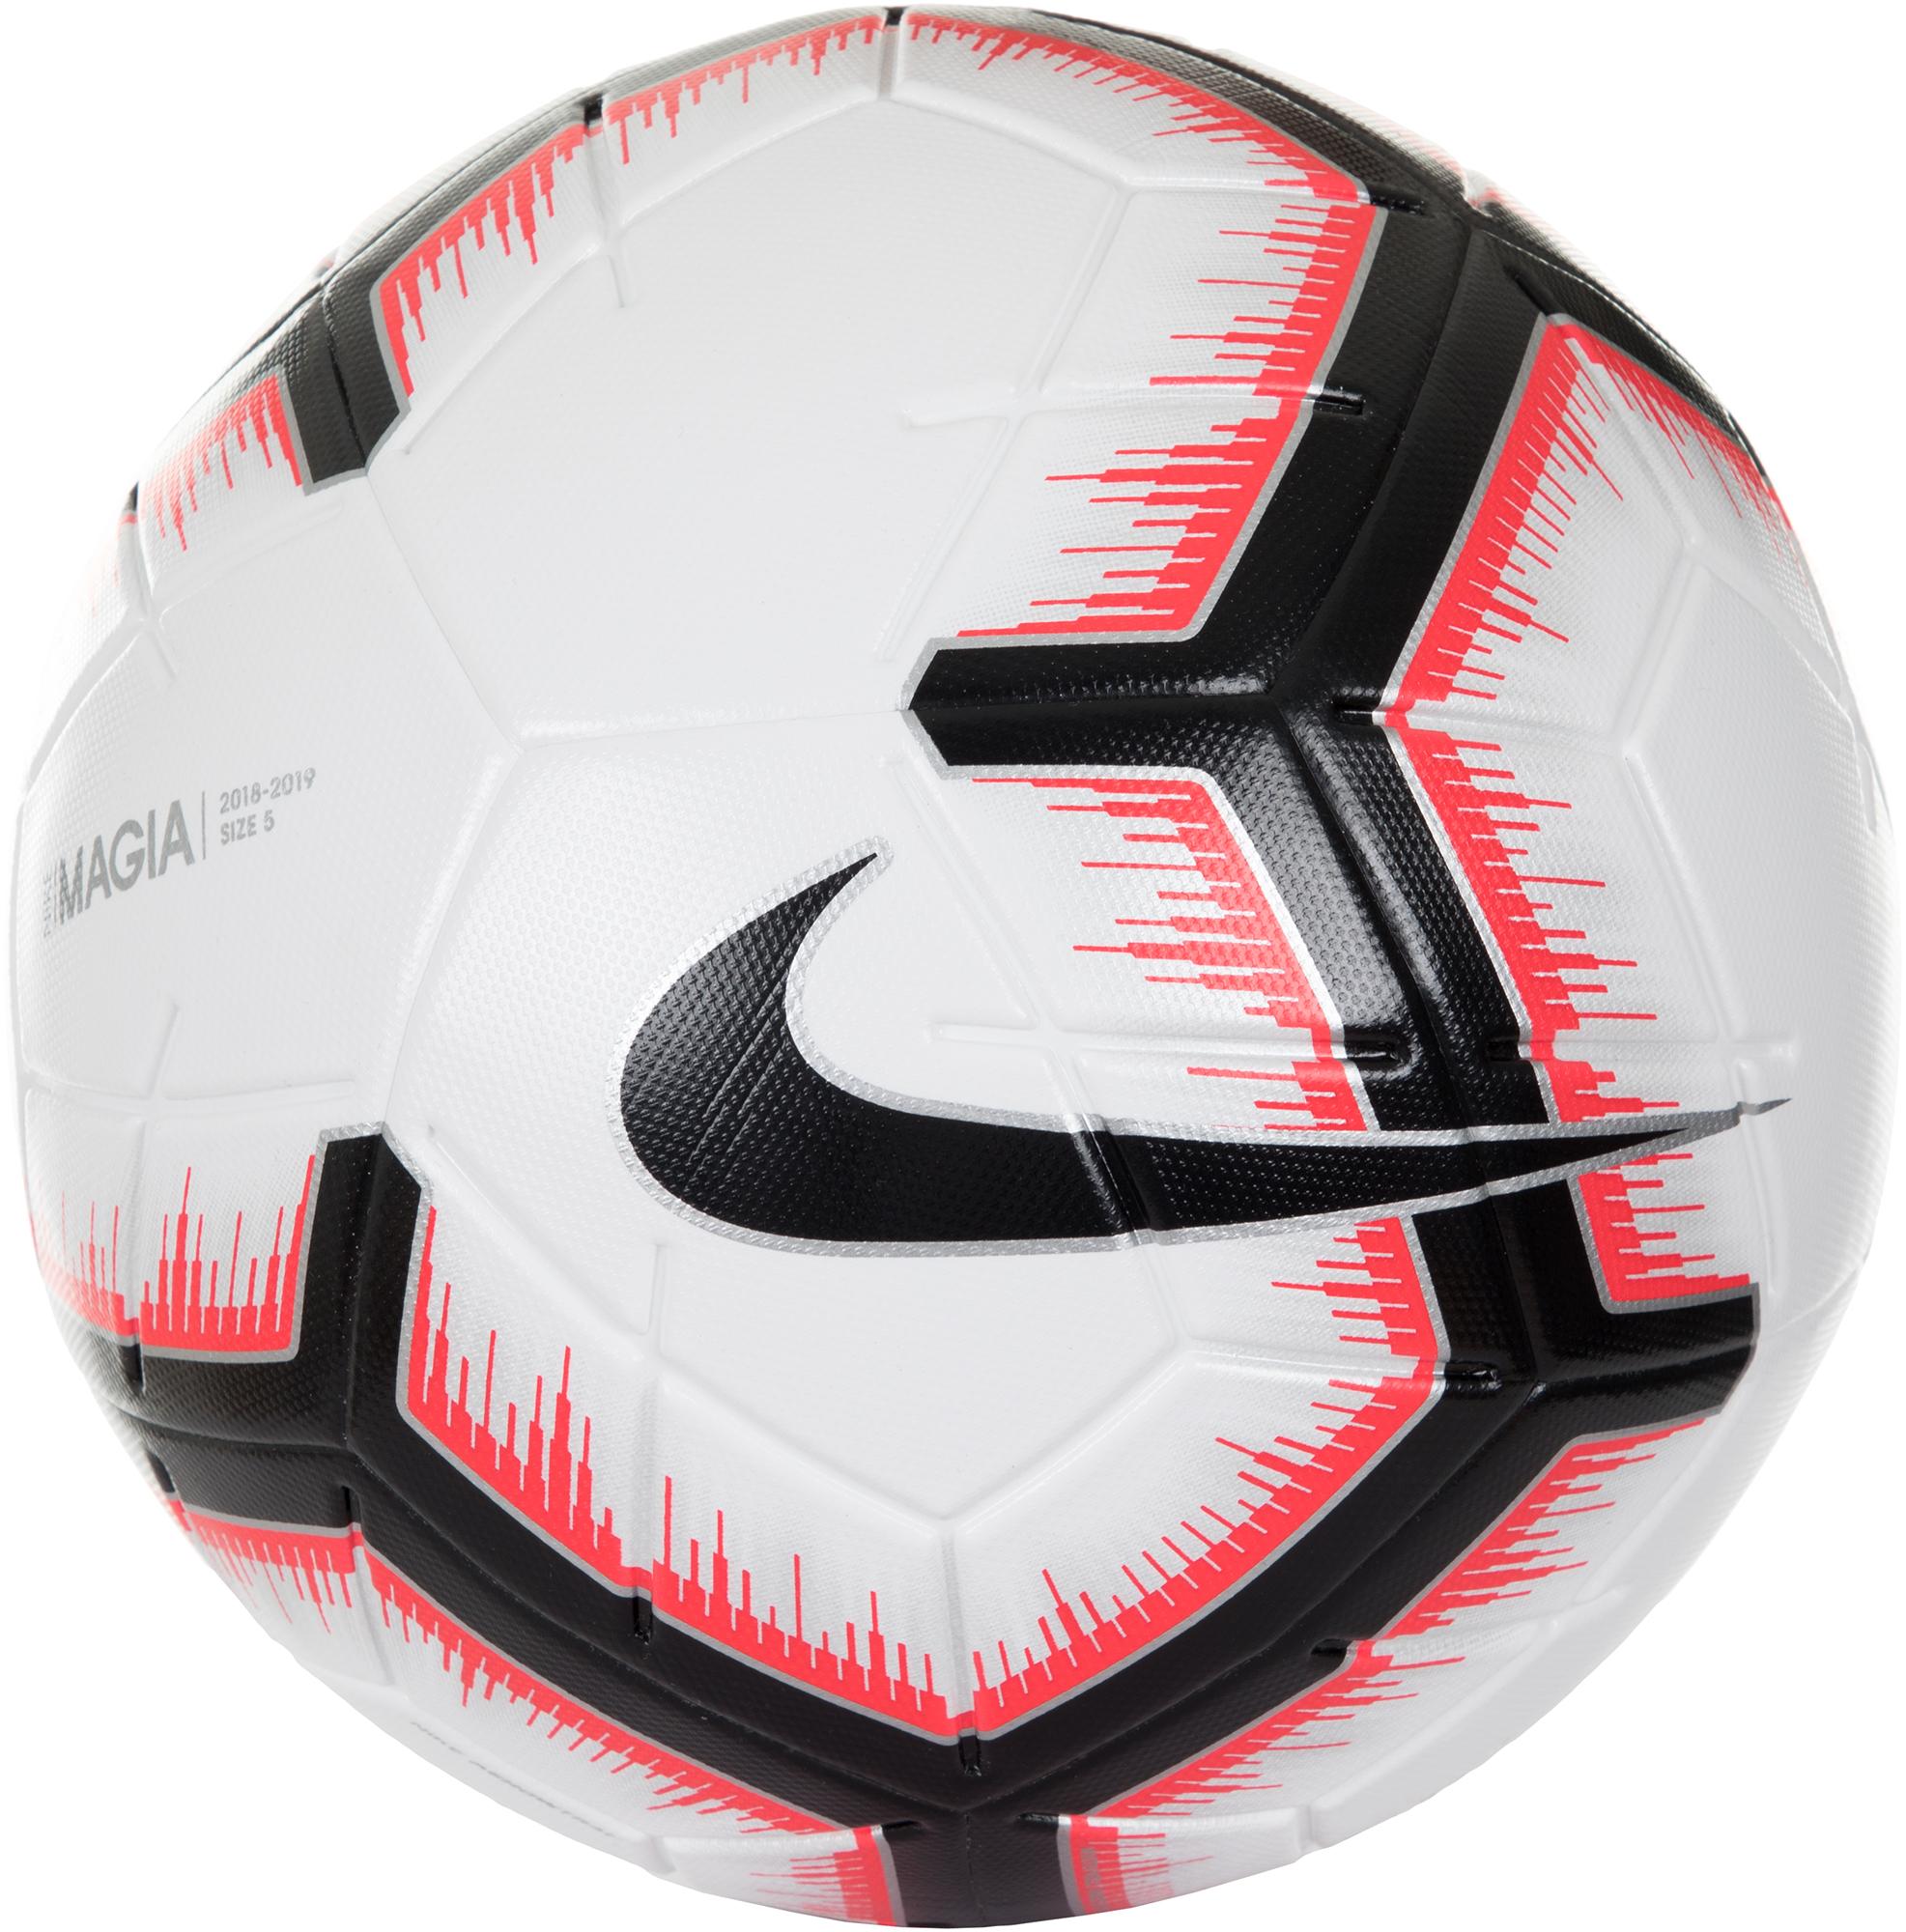 Nike Мяч футбольный Nike Magia, размер 5